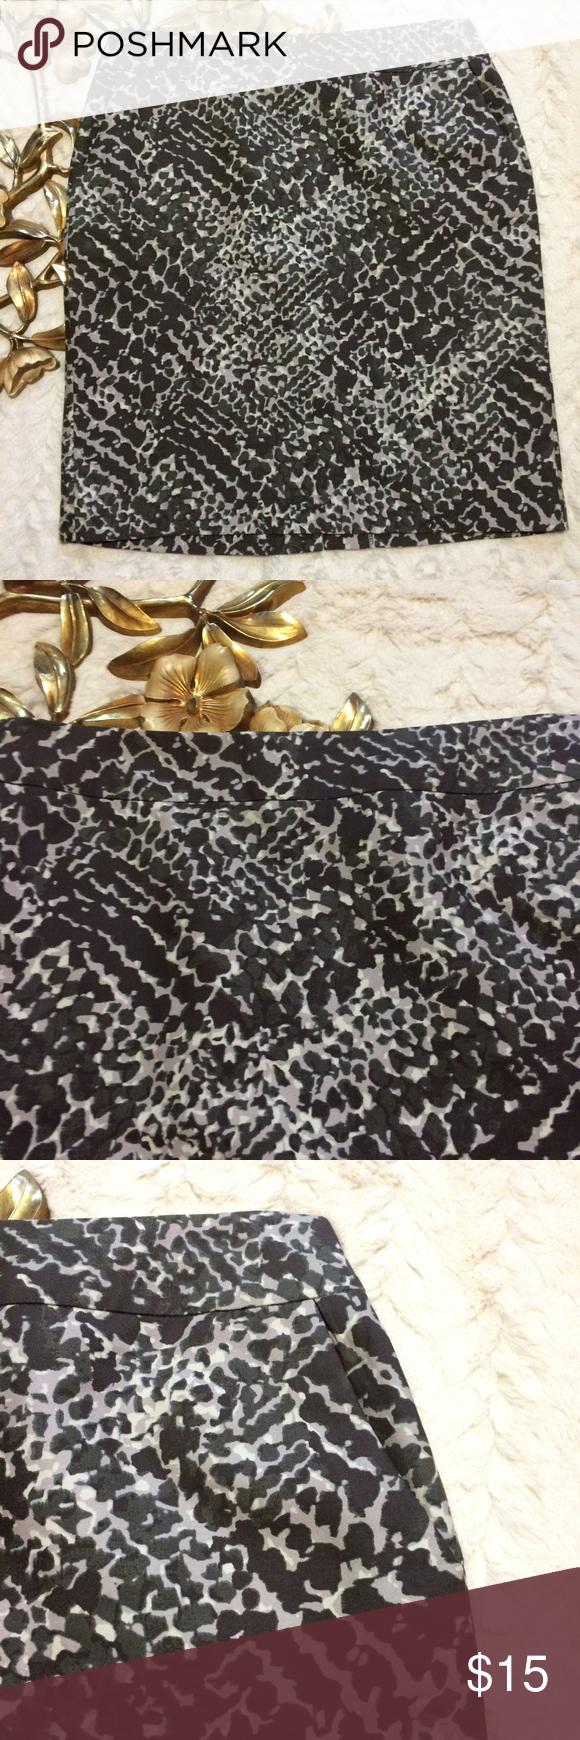 "Ann Taylor Loft Lined Skirt Ann Taylor Loft Lined Skirt side front pockets                                        Measurements taken laying flat: 21"" length 16"" waist 19"" hip LOFT Skirts Midi"